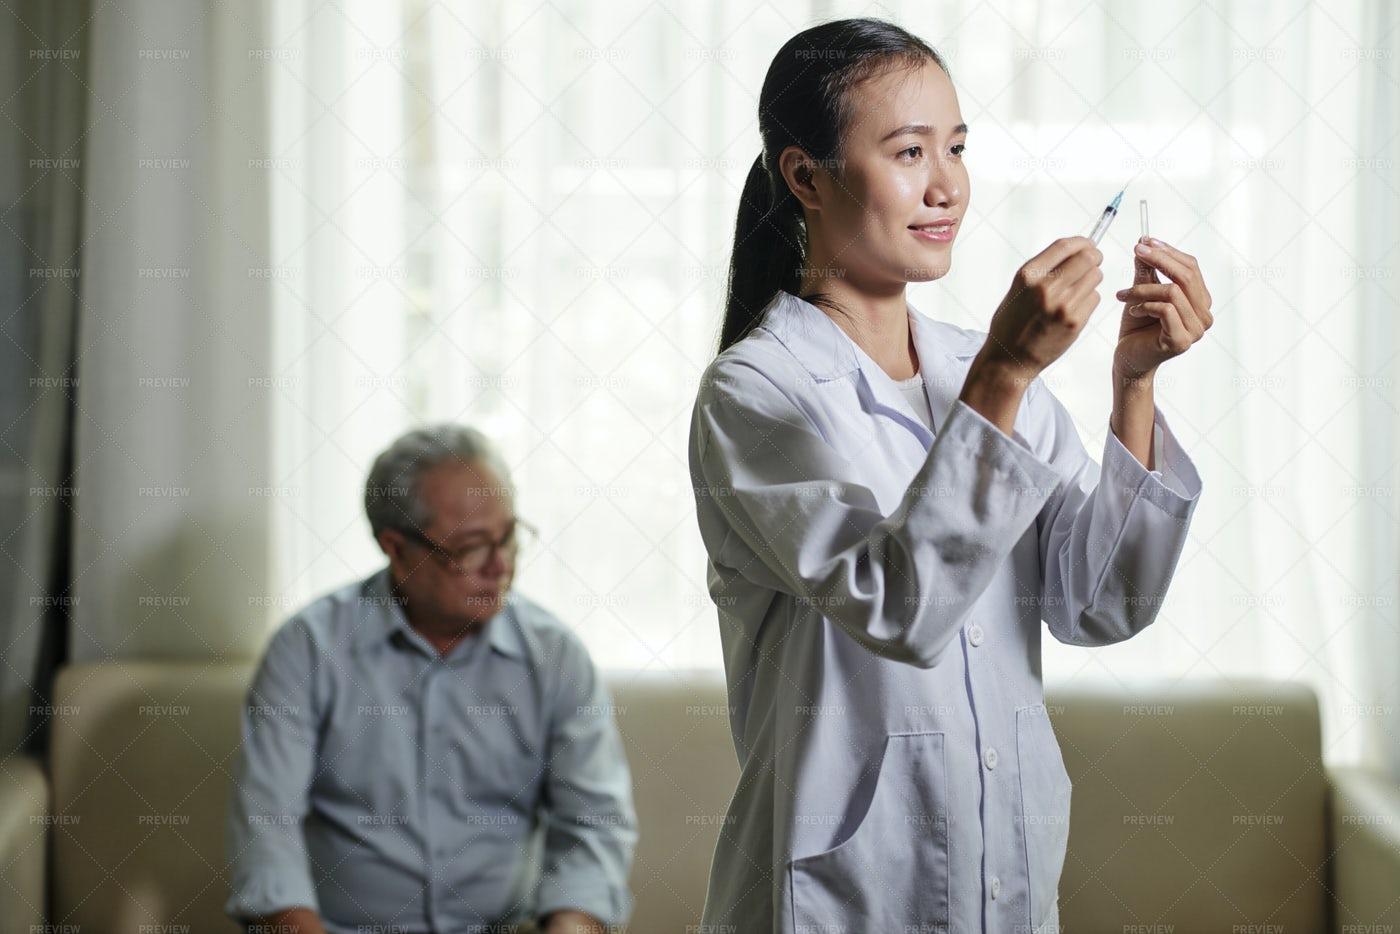 Doctor Preparing Vaccine For Senior Man: Stock Photos